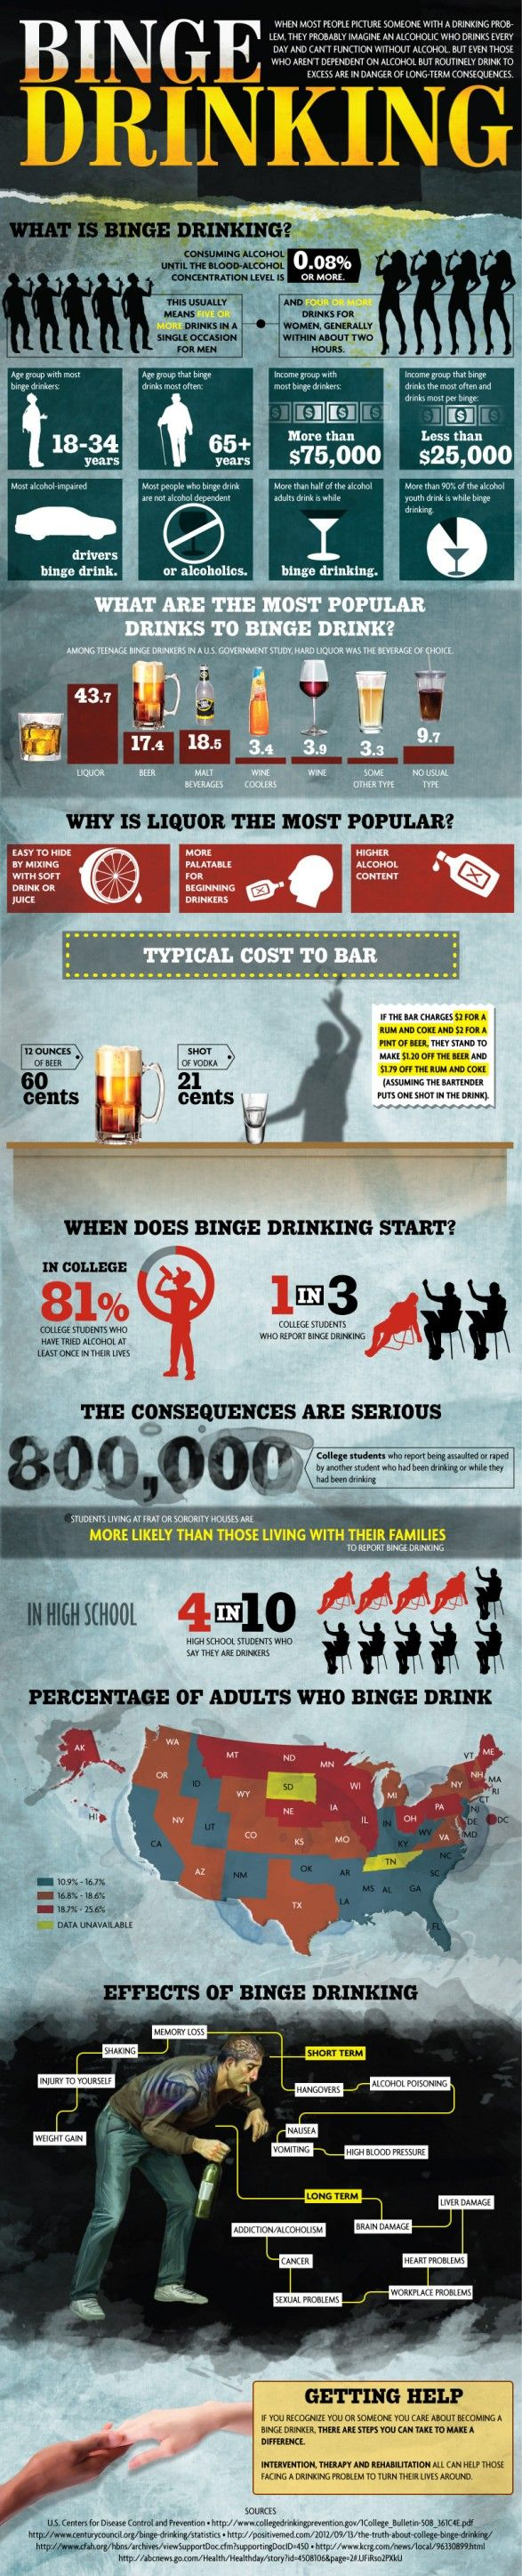 Binge Drinking Infographic http://www.dailyinspiration.nl/binge-drinking-infographic/